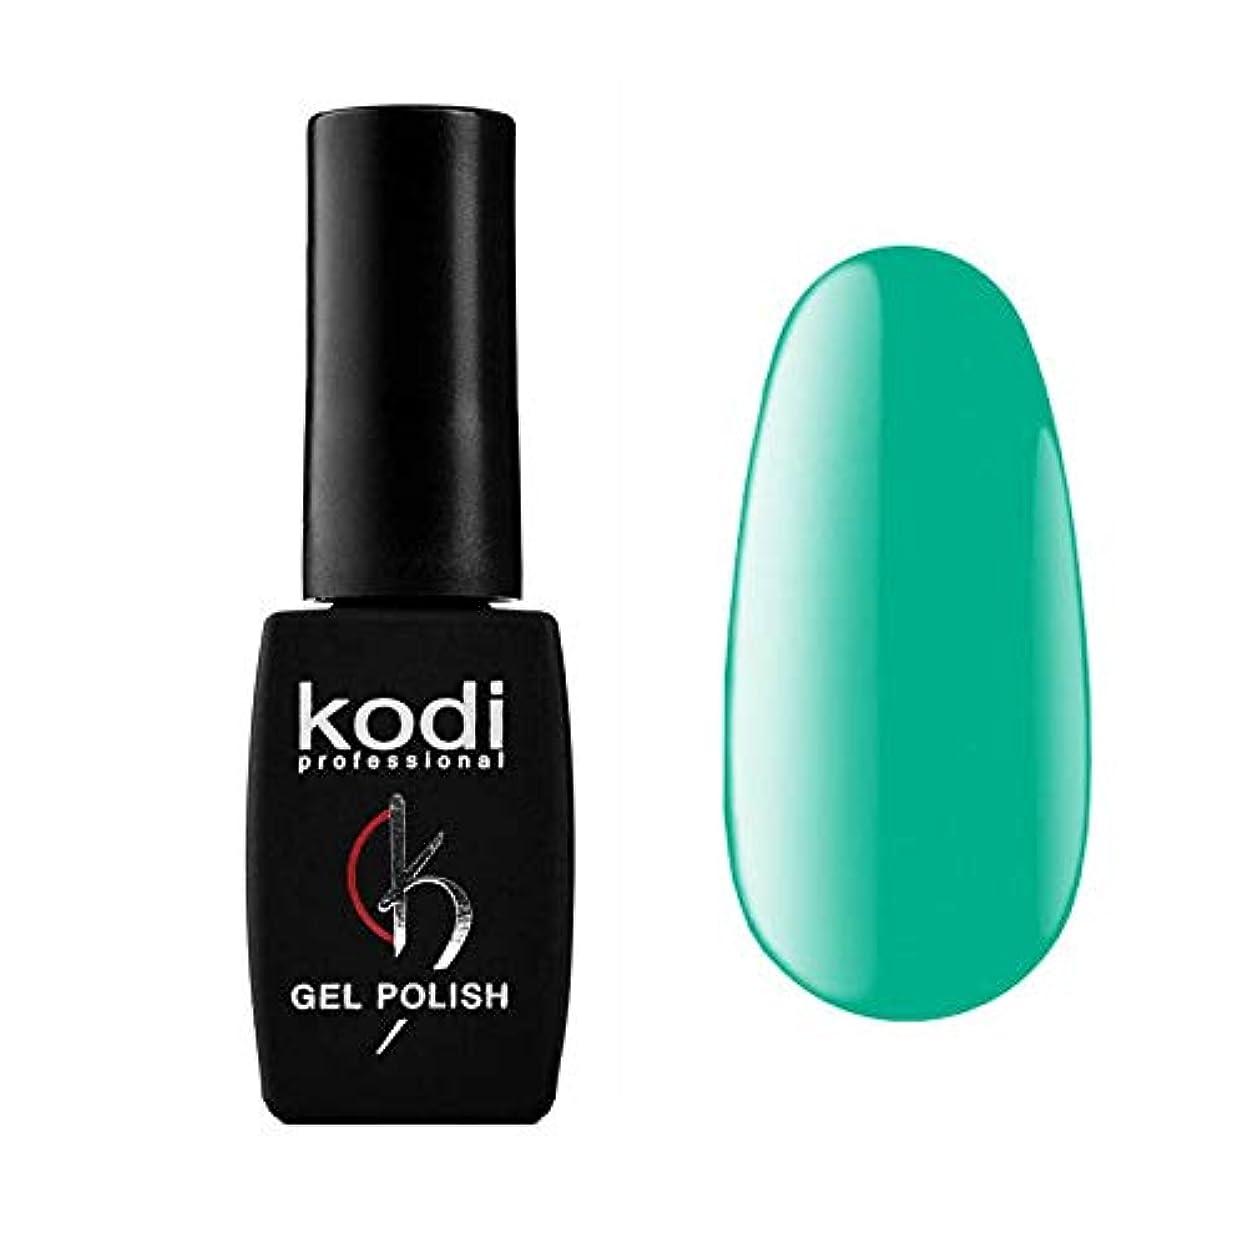 Kodi Professional New Collection AQ AQUAMARINE #20 Color Gel Nail Polish 12ml 0.42 Fl Oz LED UV Genuine Soak Off